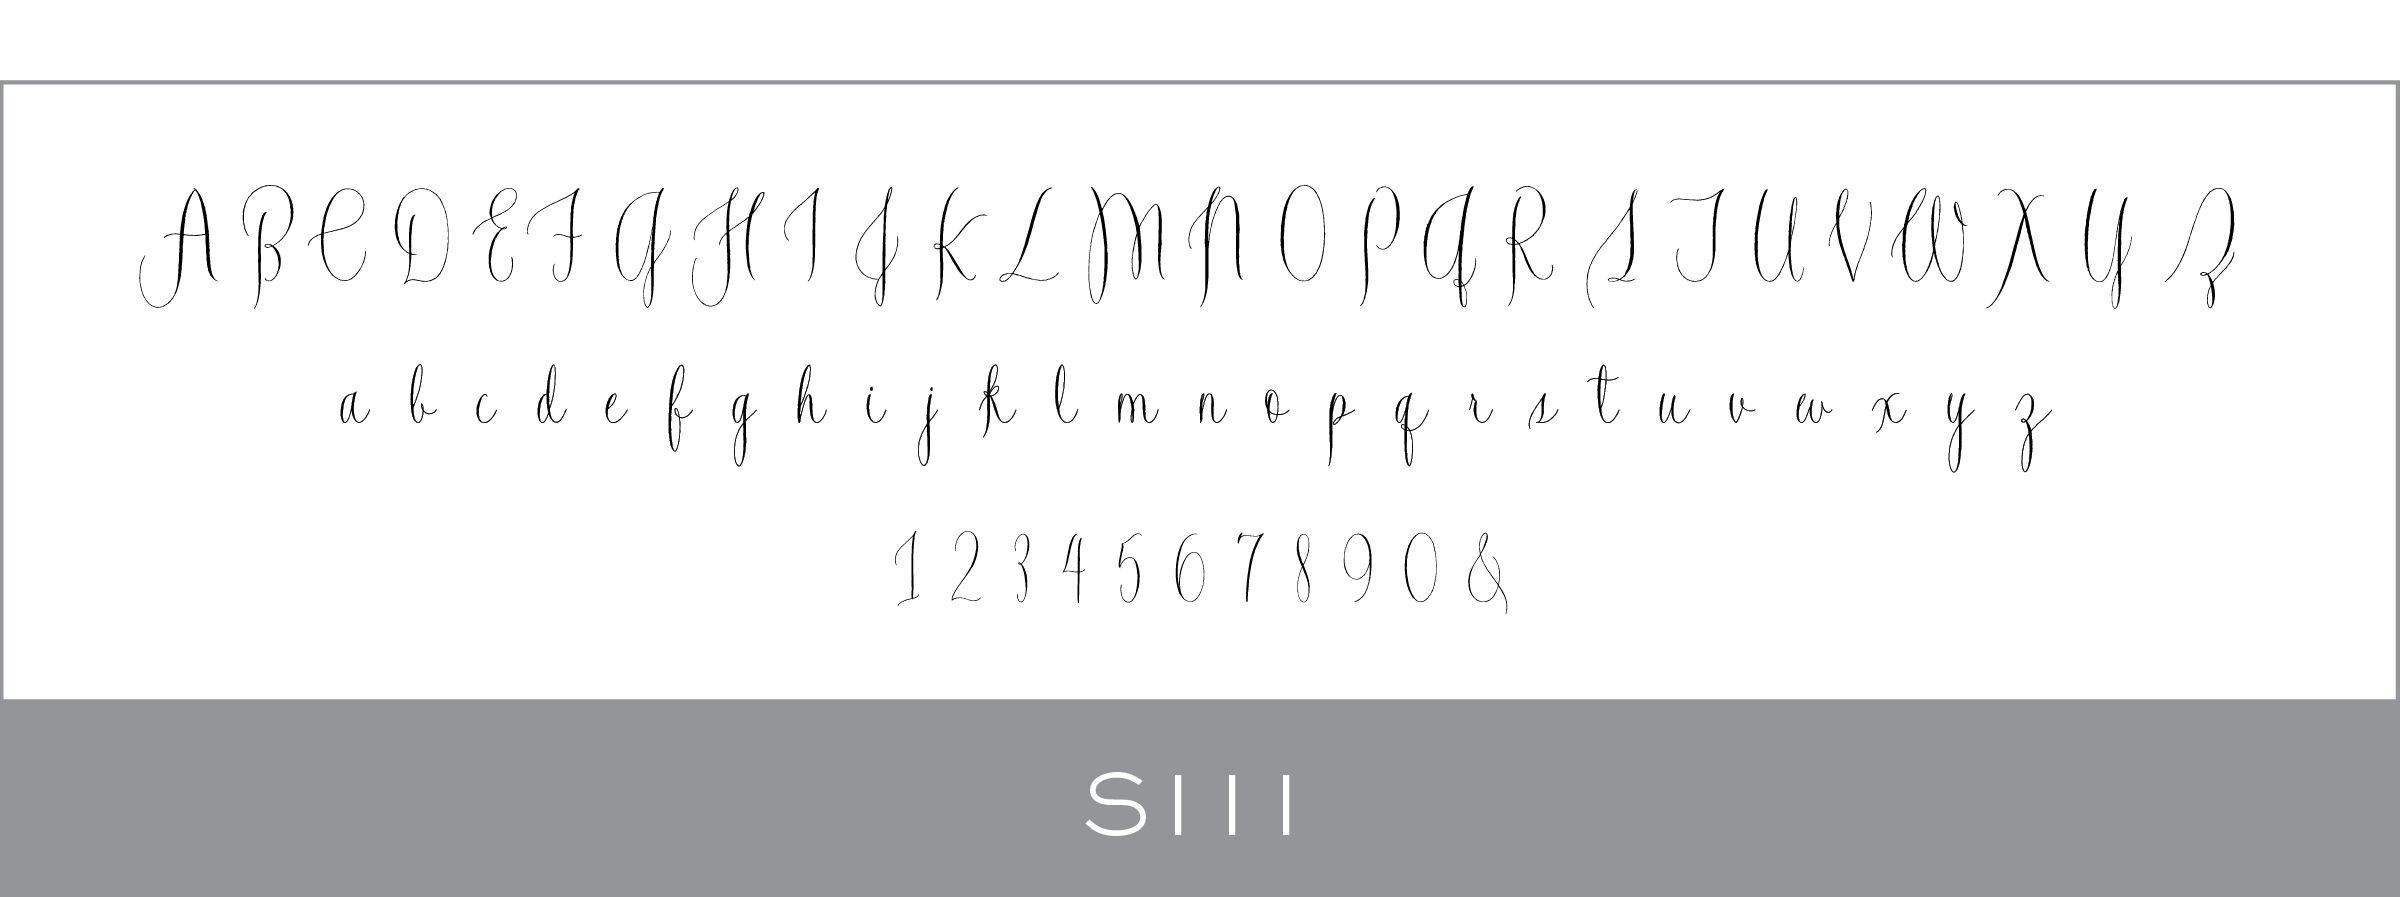 S111_Haute_Papier_Font.jpg